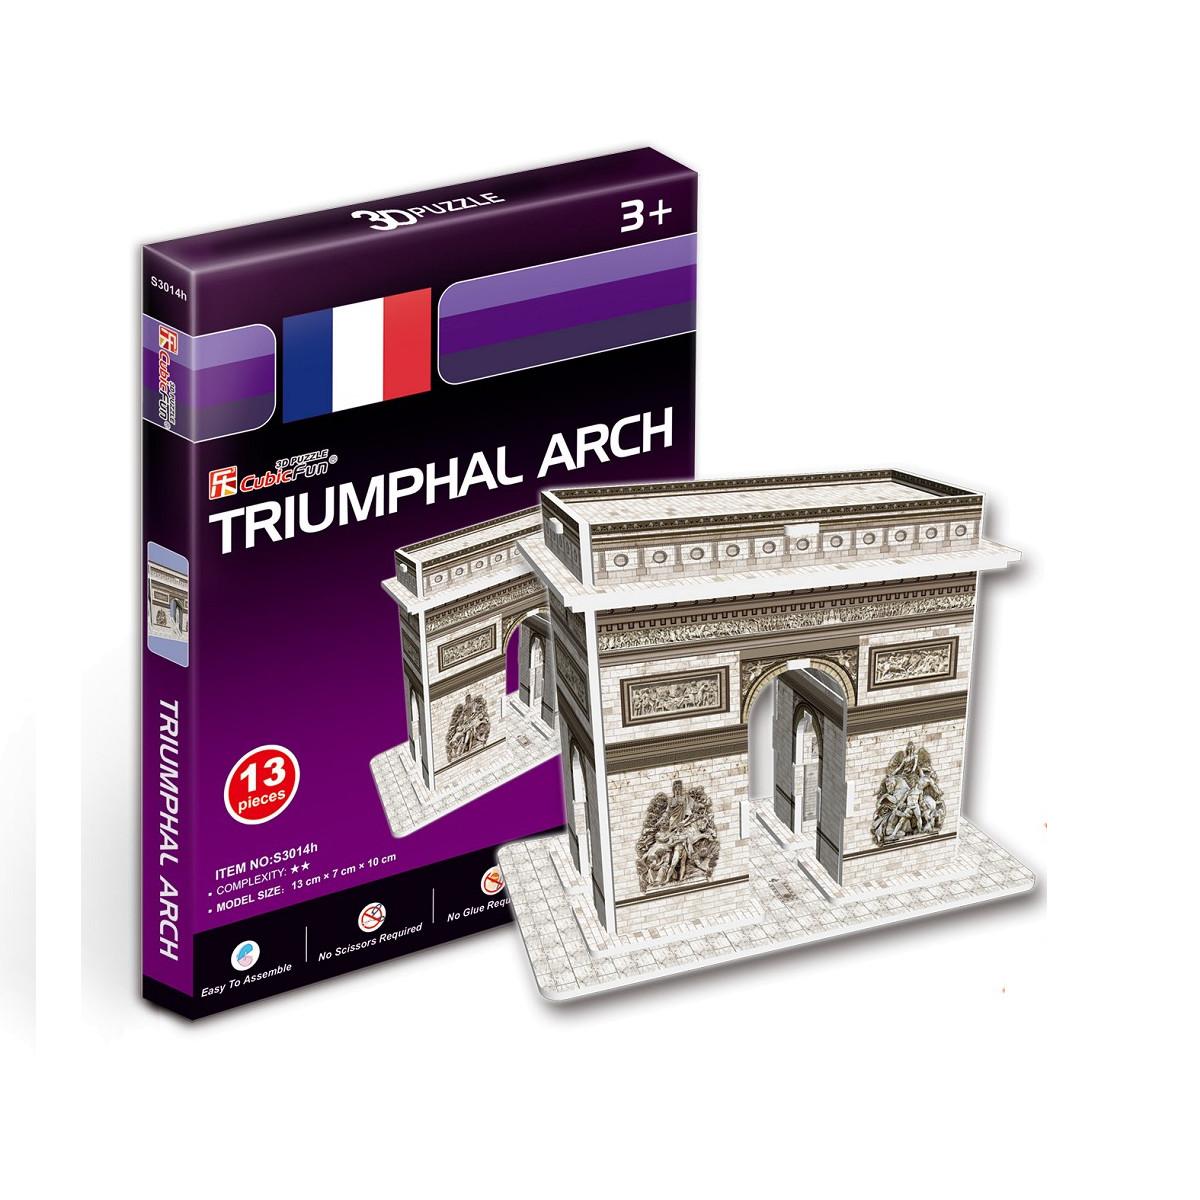 Объемный 3D-пазл Триумфальная арка, Франция, мини серияПазлы объёмные 3D<br>Объемный 3D-пазл Триумфальная арка, Франция, мини серия<br>